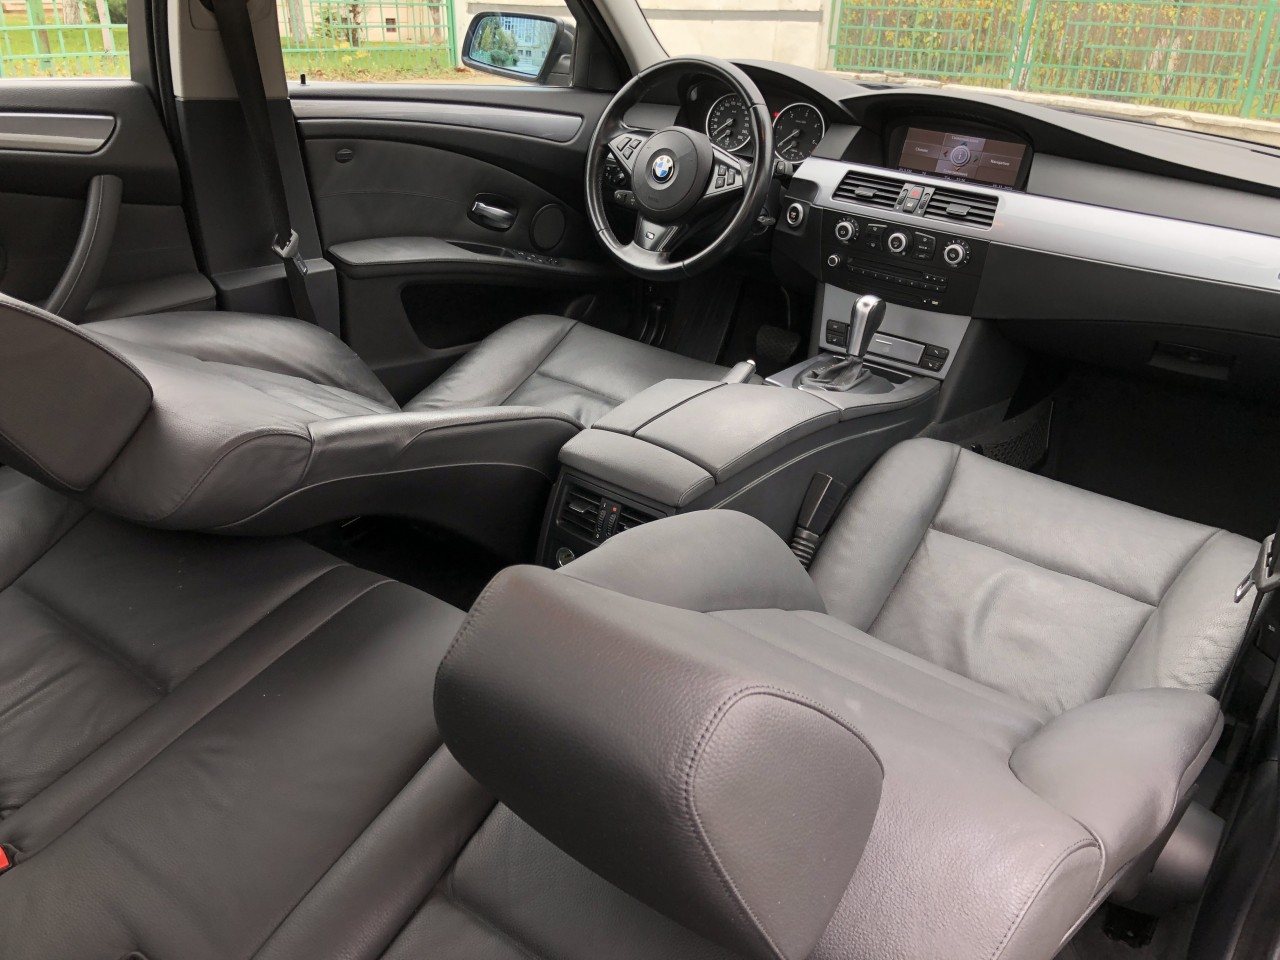 BMW 520 BMW 520d FaceLift 163CP!!!–Automata / Navi Mare / Bi-xenon / Piele / Pilot / PDC fata+spate / Bluetooth / Volan M5 / Magazie 6CD etc... RECENT ADUSA DIN GERMANIA!!! 2007